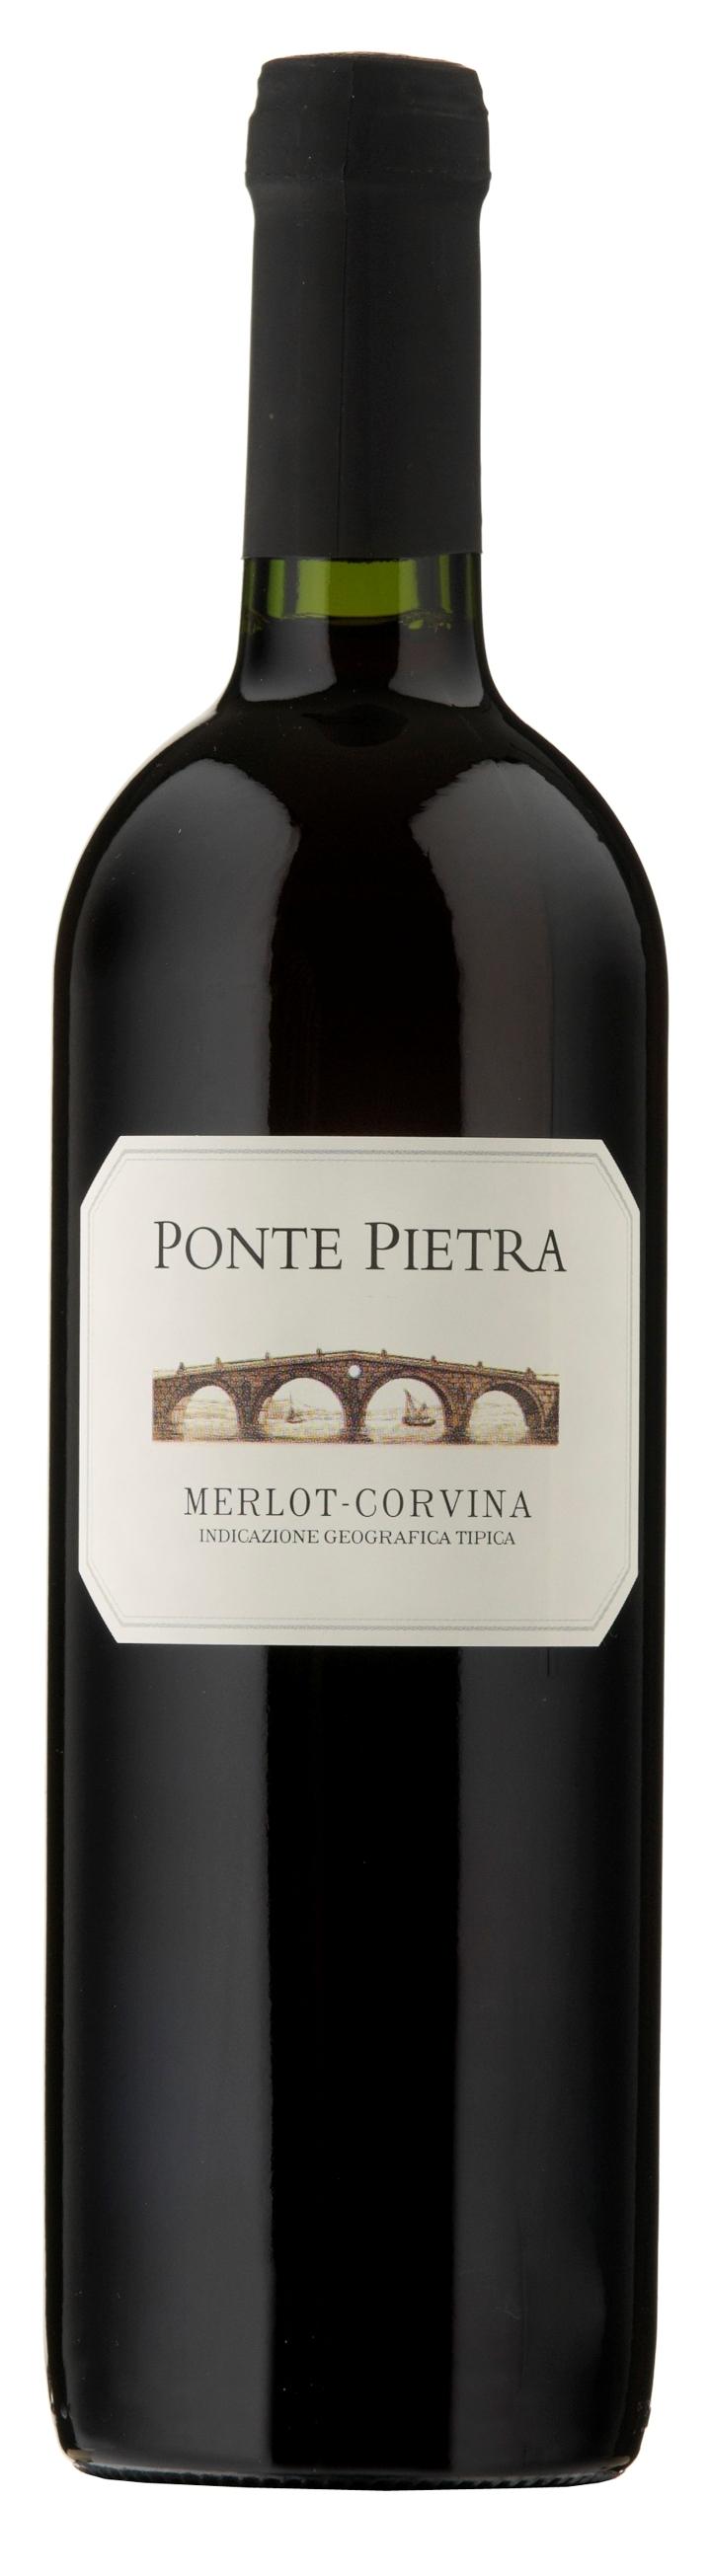 Ponte Pietra, Merlot/Corvina 2017